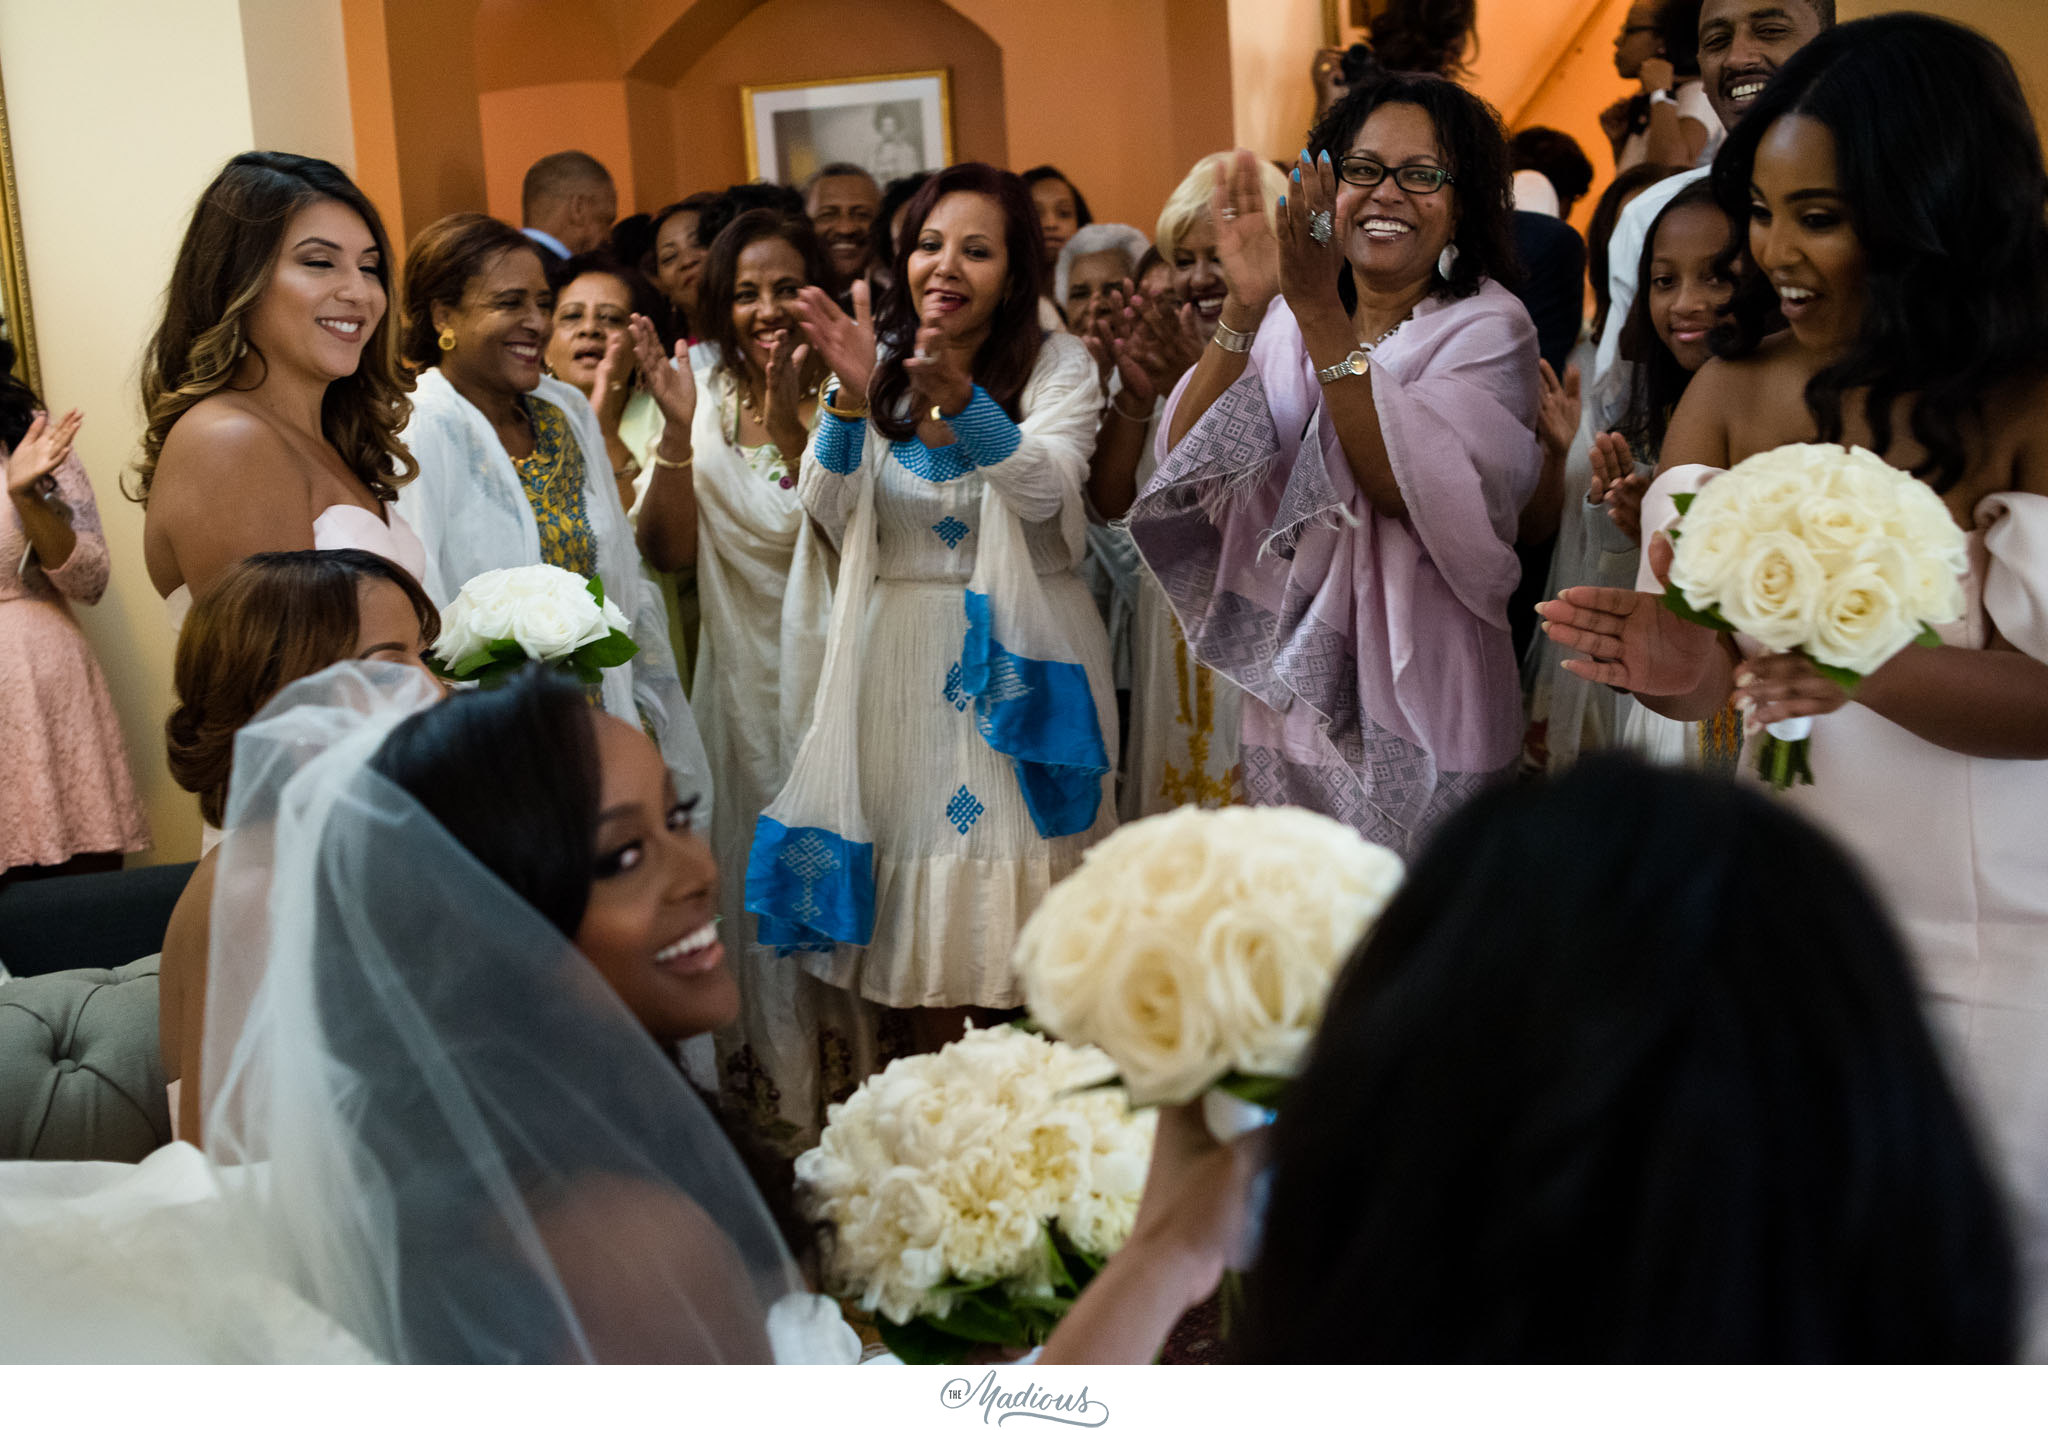 nmwa+wedding,+women+in+the+arts+wedding,+ethiopian+wedding,+dc+wedding+0030.jpg